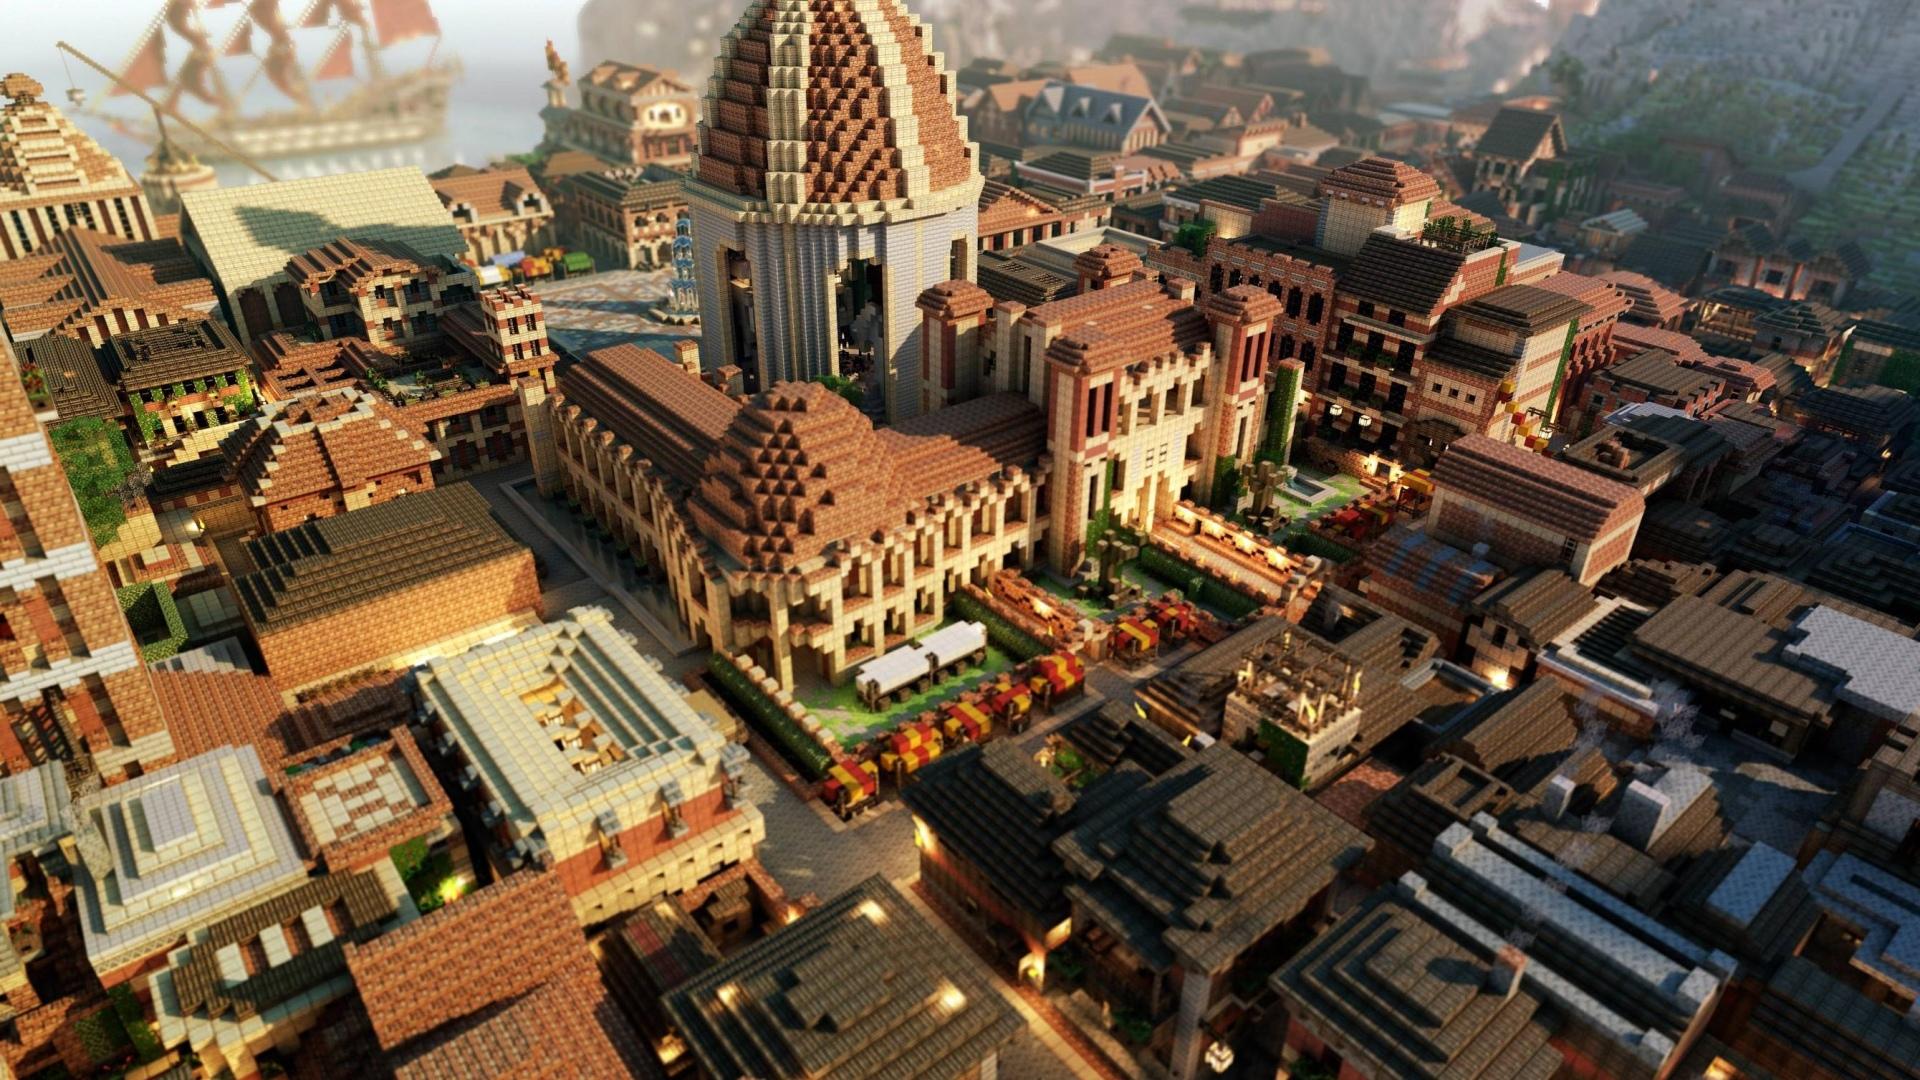 Fondos De Pantalla De Minecraft Wallpapers HD E Imgenes Gratis